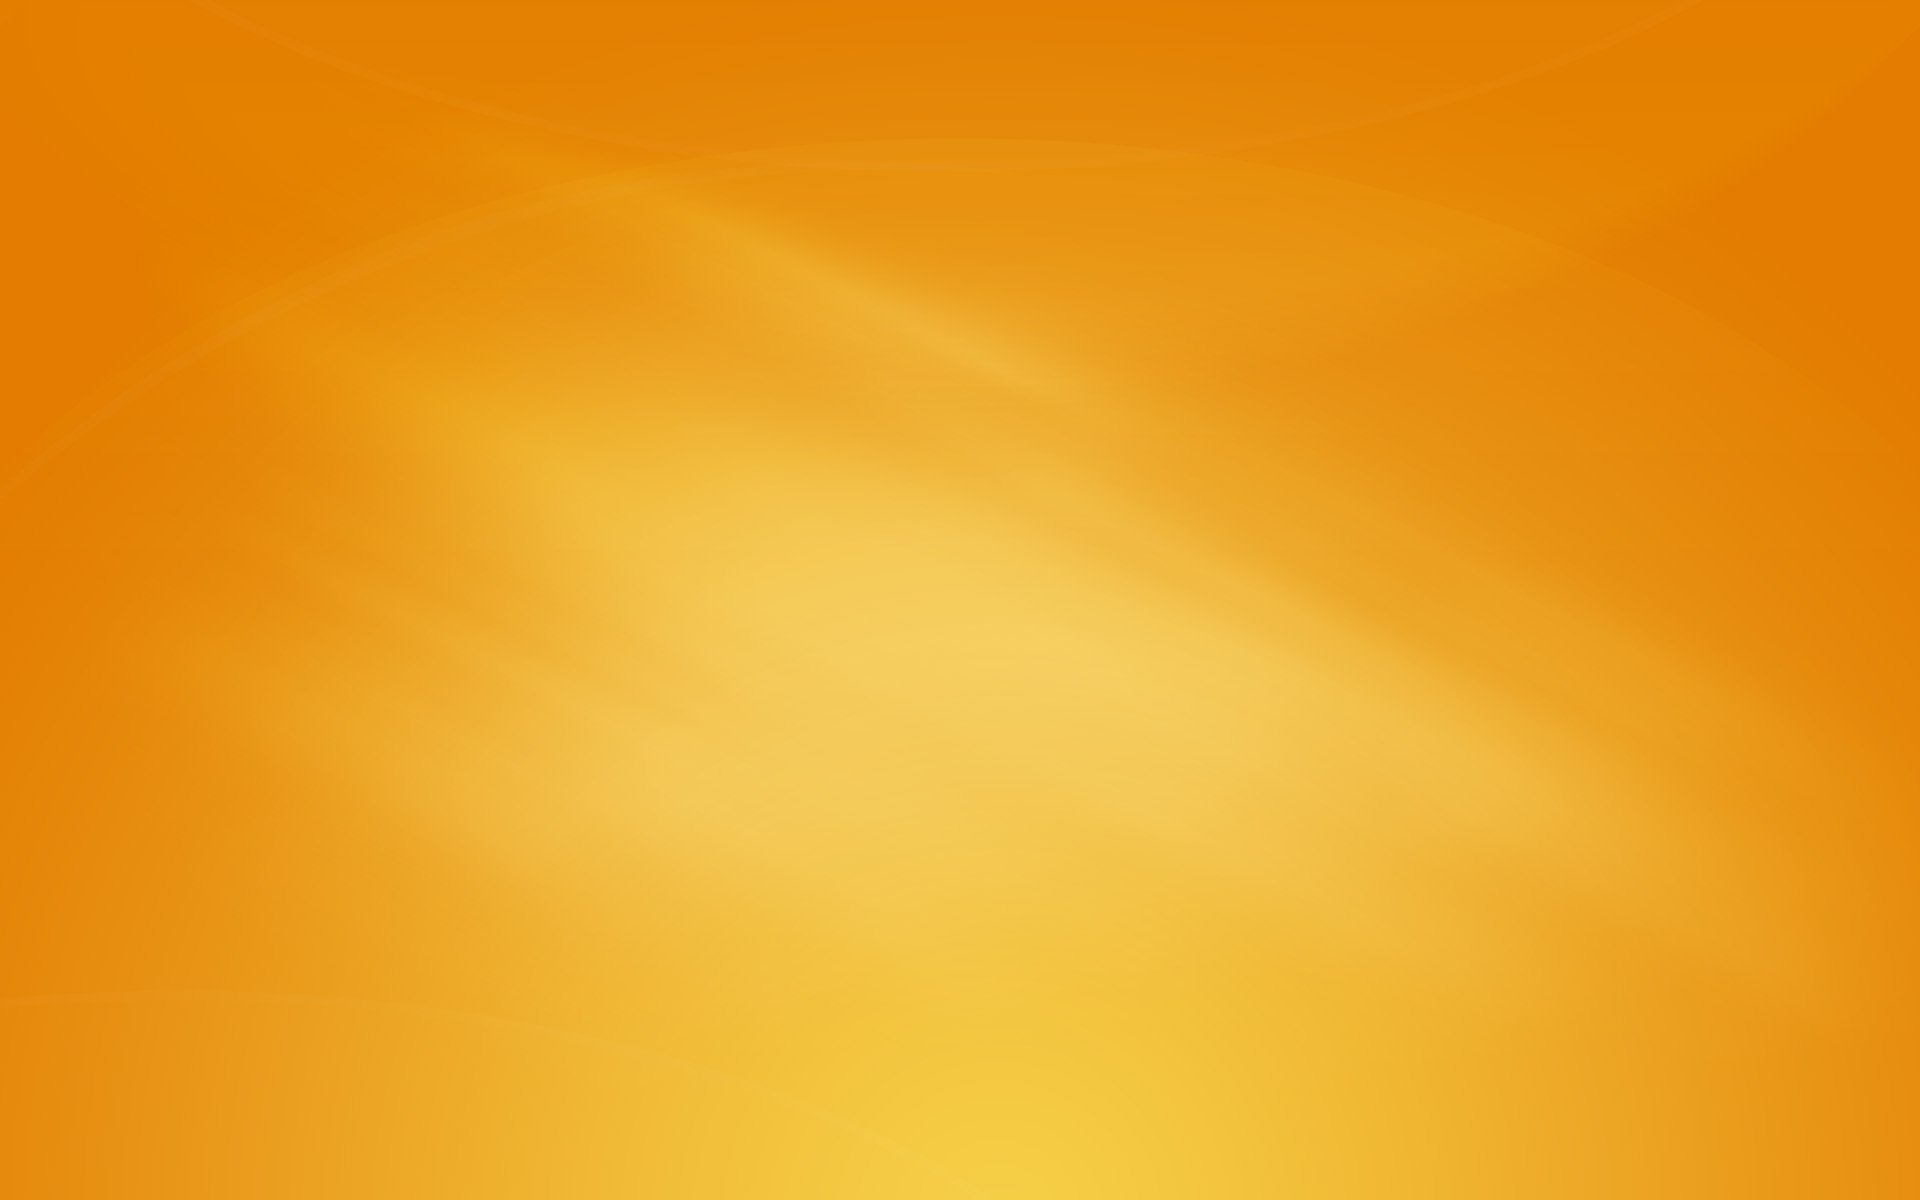 Windows 10 Wallpaper Background Color - WallpaperSafari